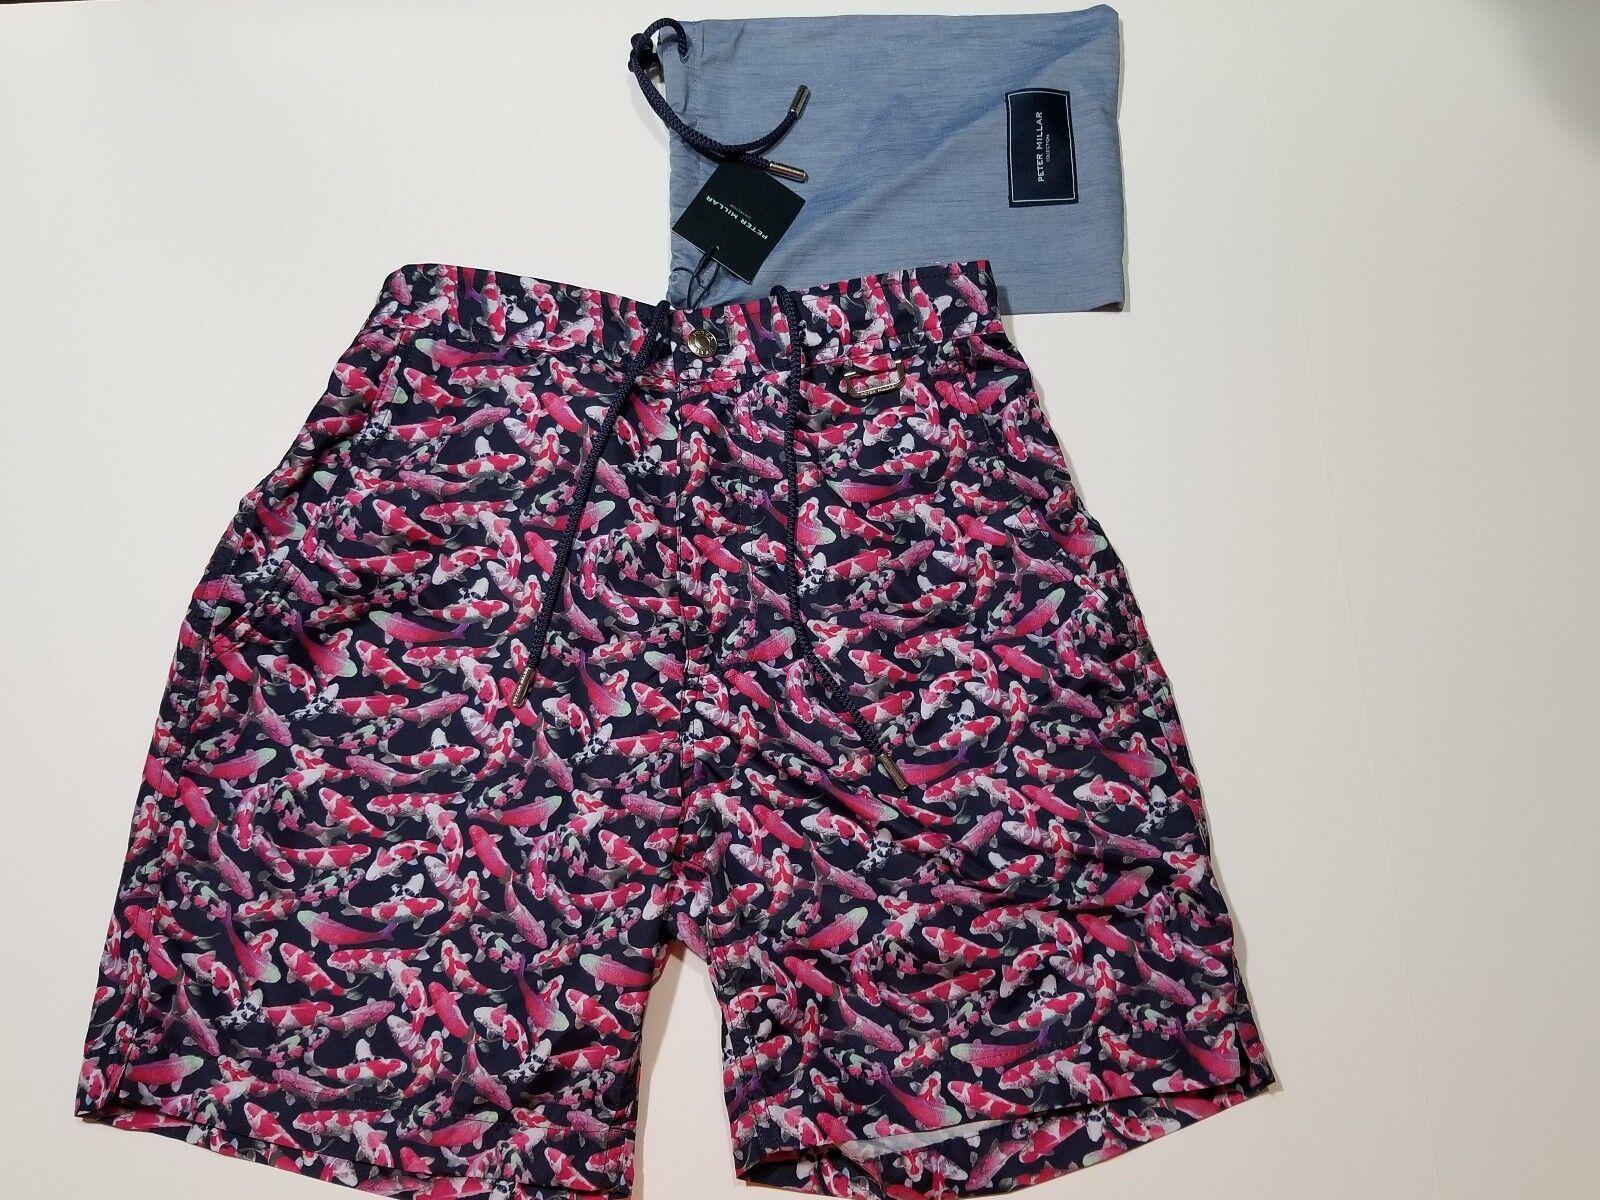 Peter Millar Koi Print Swim Trunk with Carry Bag - Small - Retail